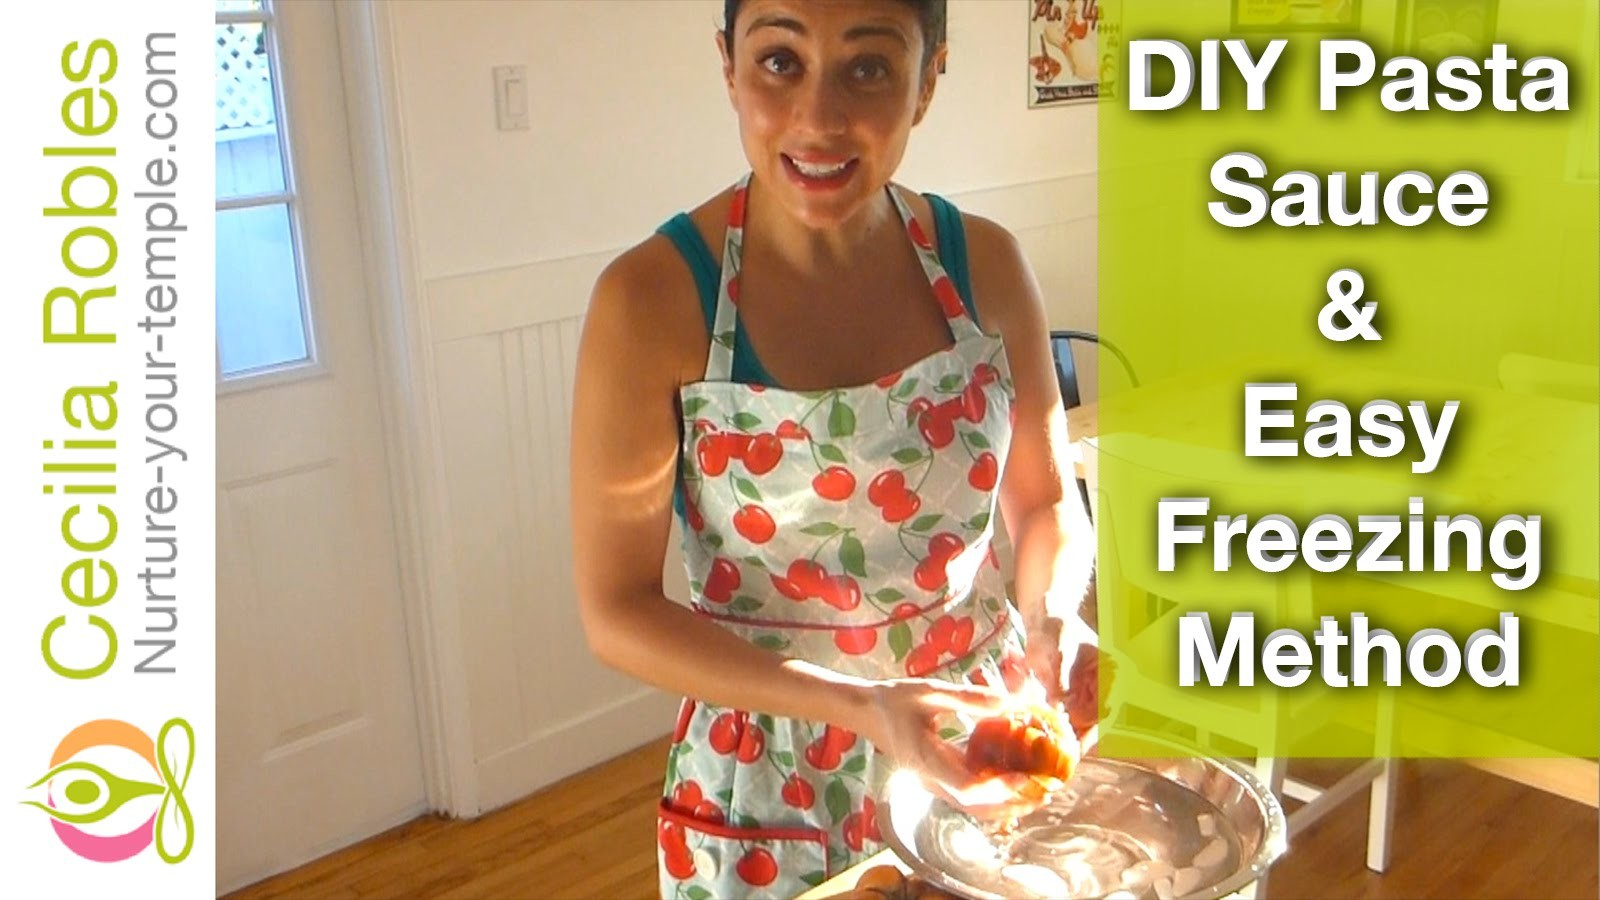 DIY Pasta Sauce & Funny Freezing Method